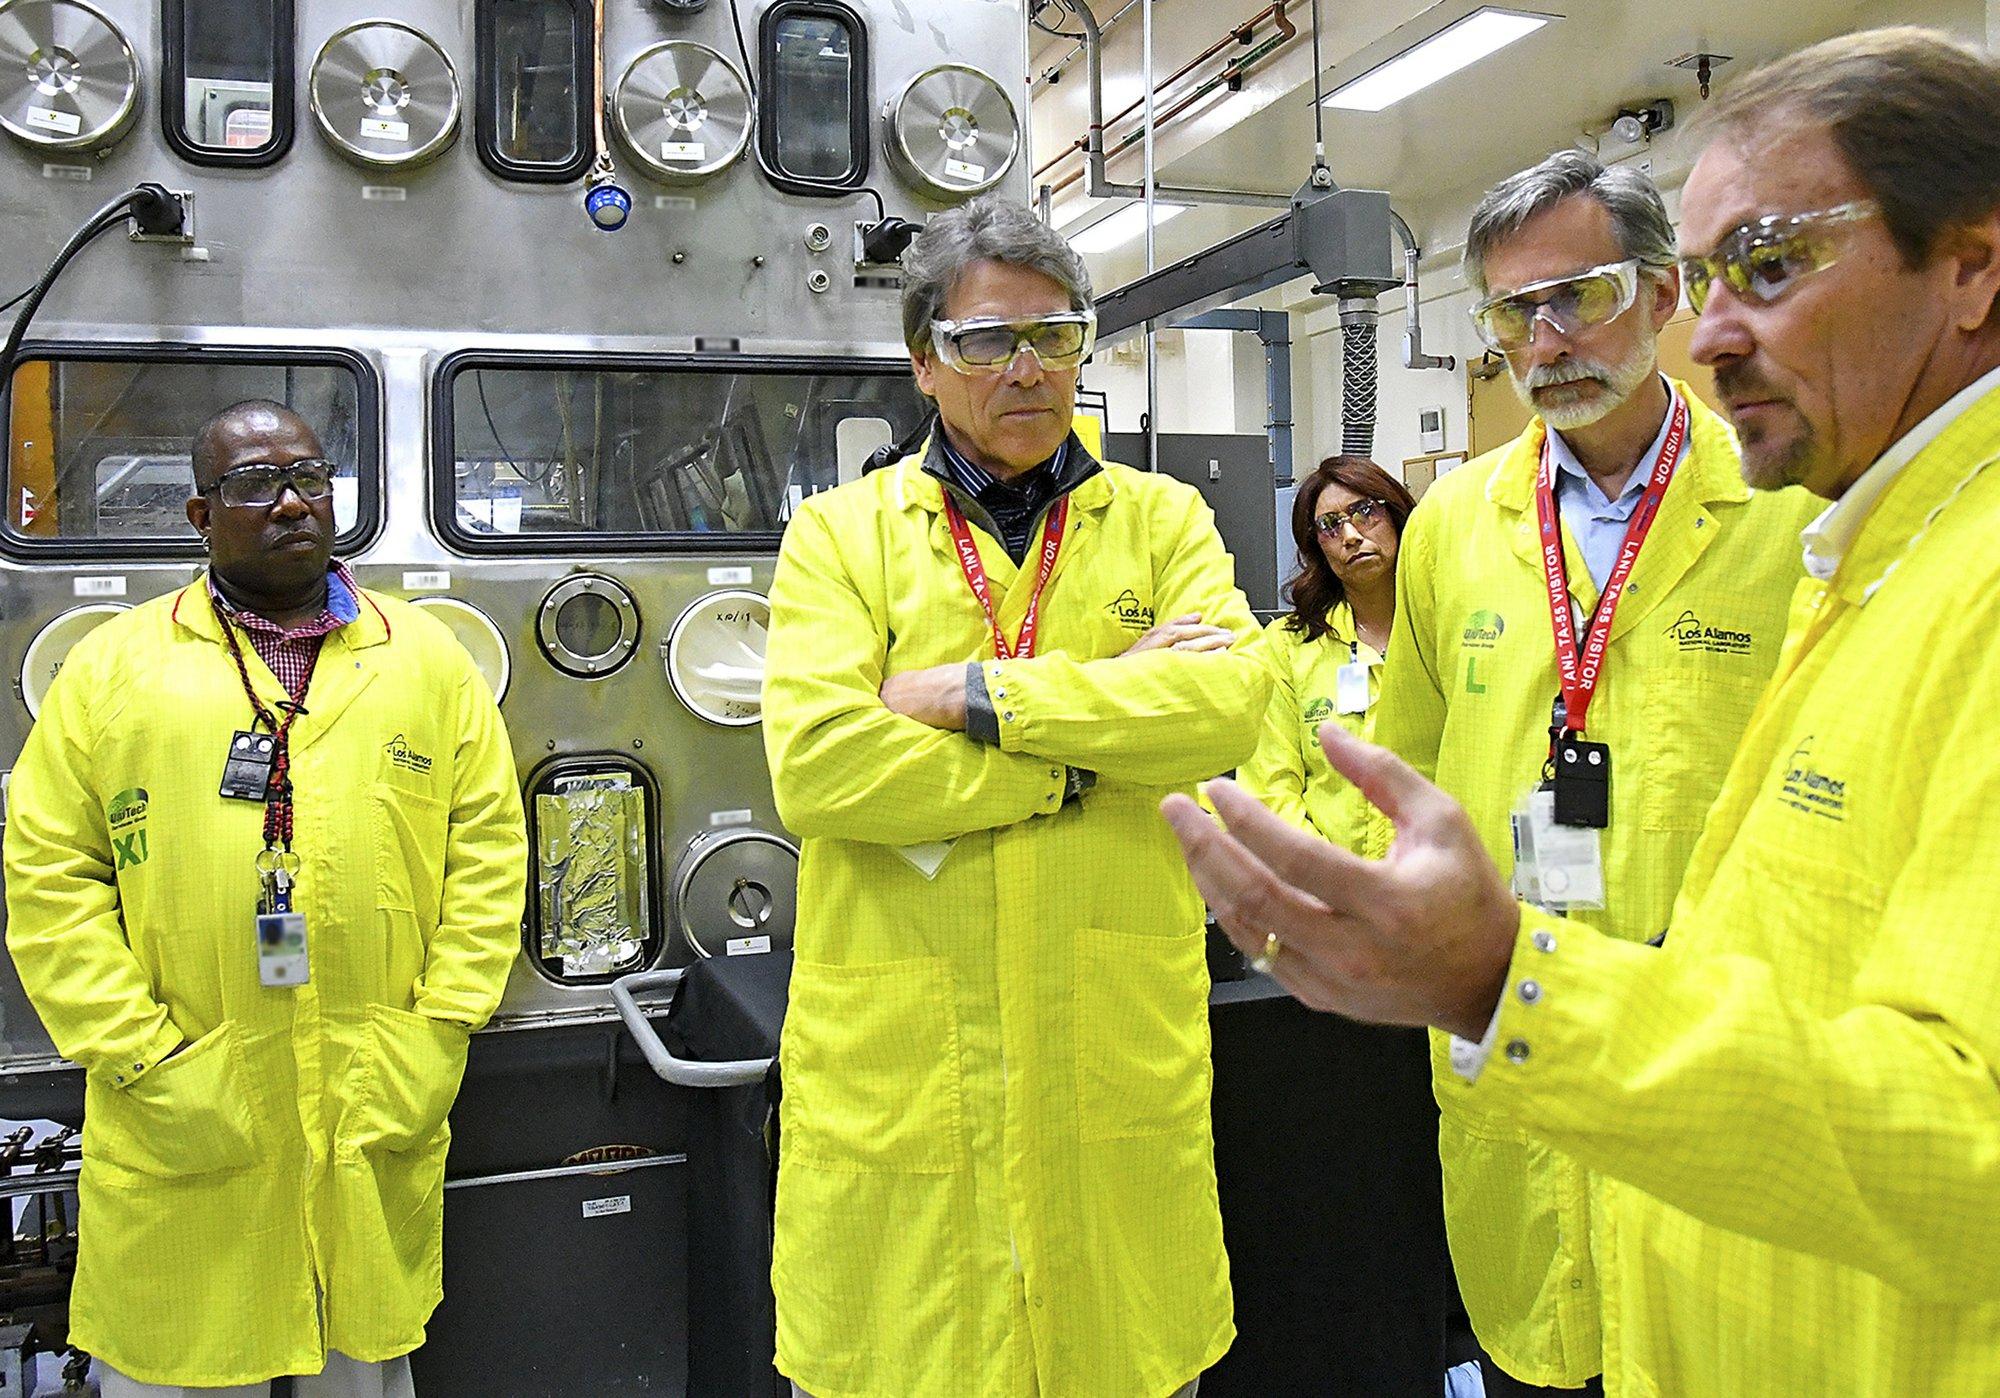 Energy secretary returns to Nevada nuke site in legal fight